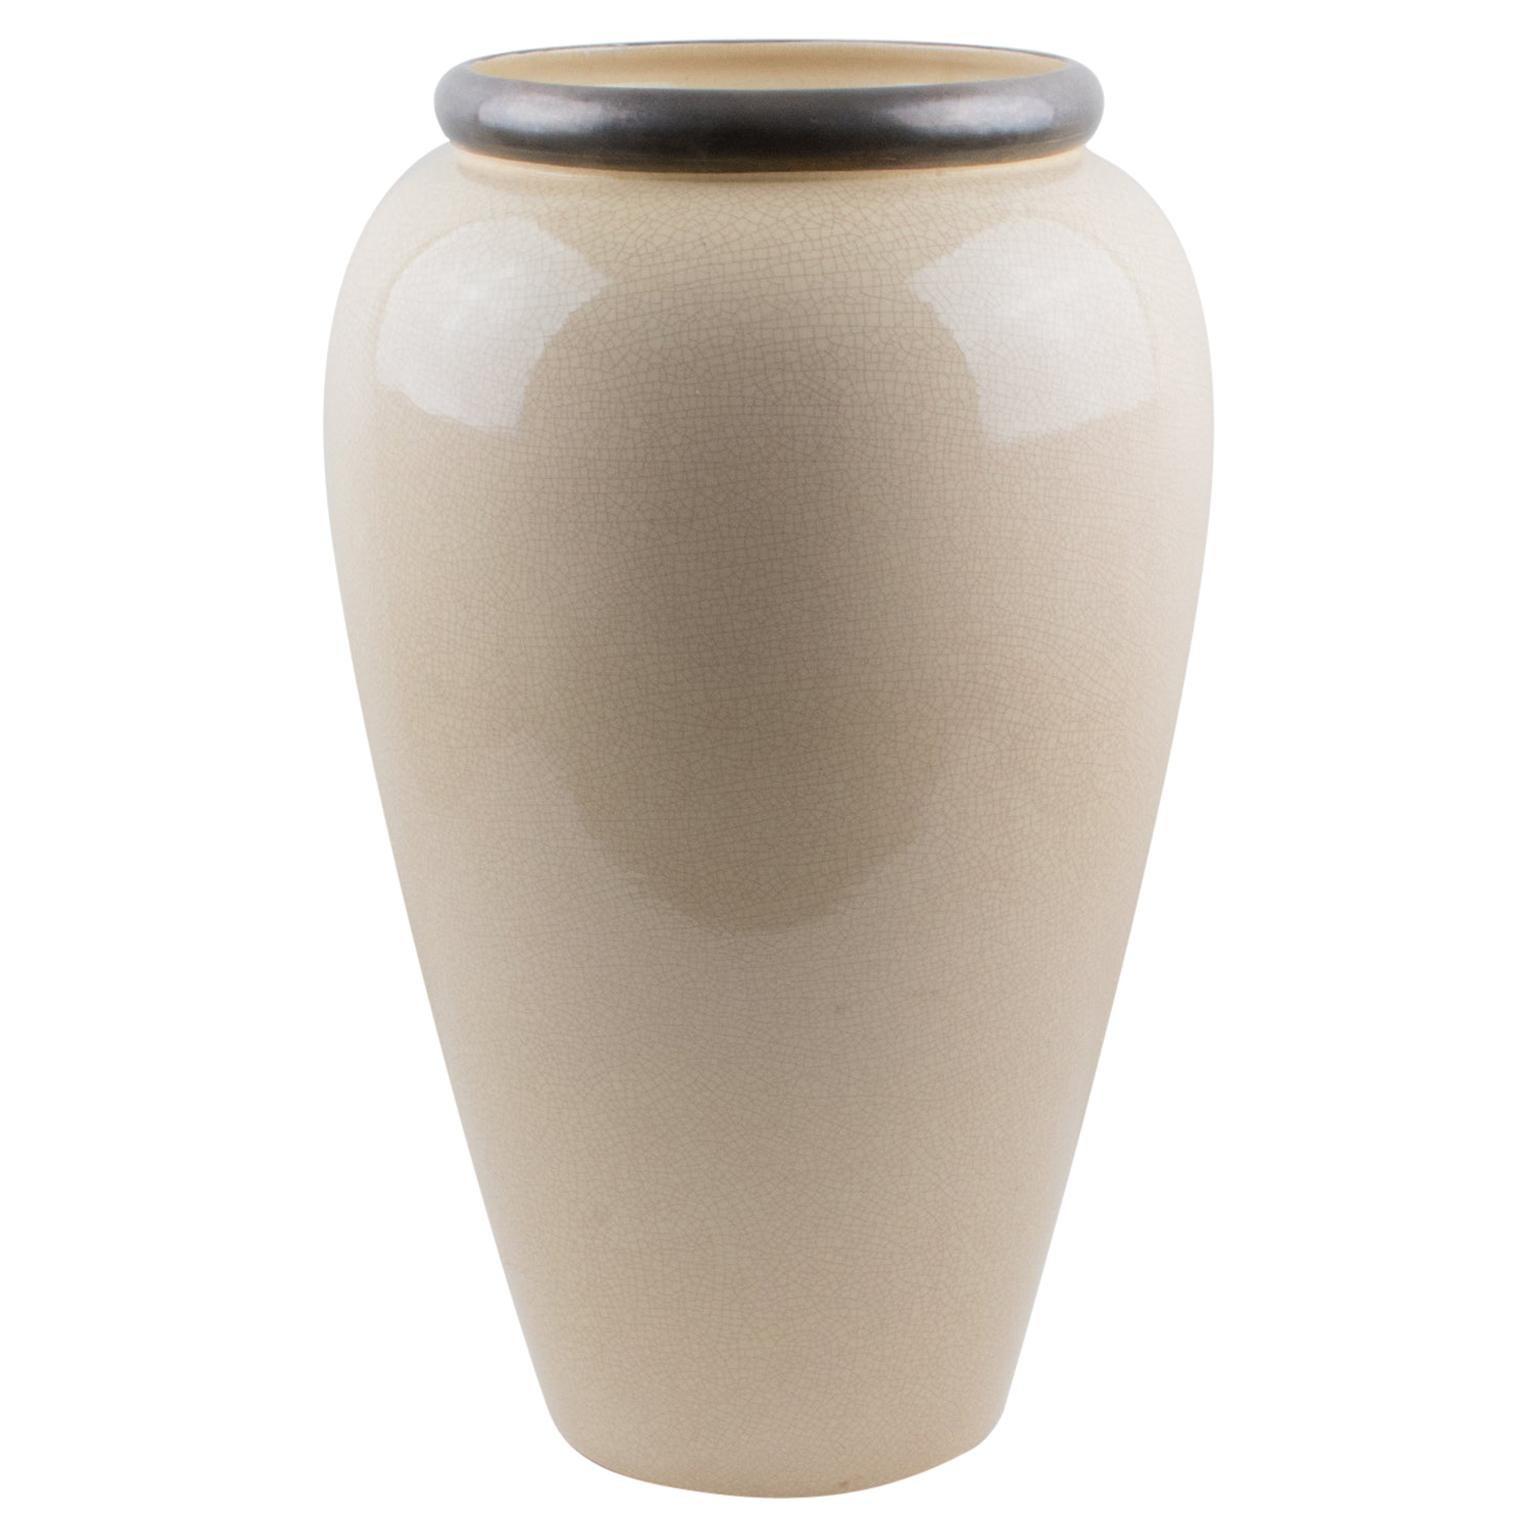 Saint Clement Art Deco Crackle Glaze Ceramic Vase Umbrella Stand